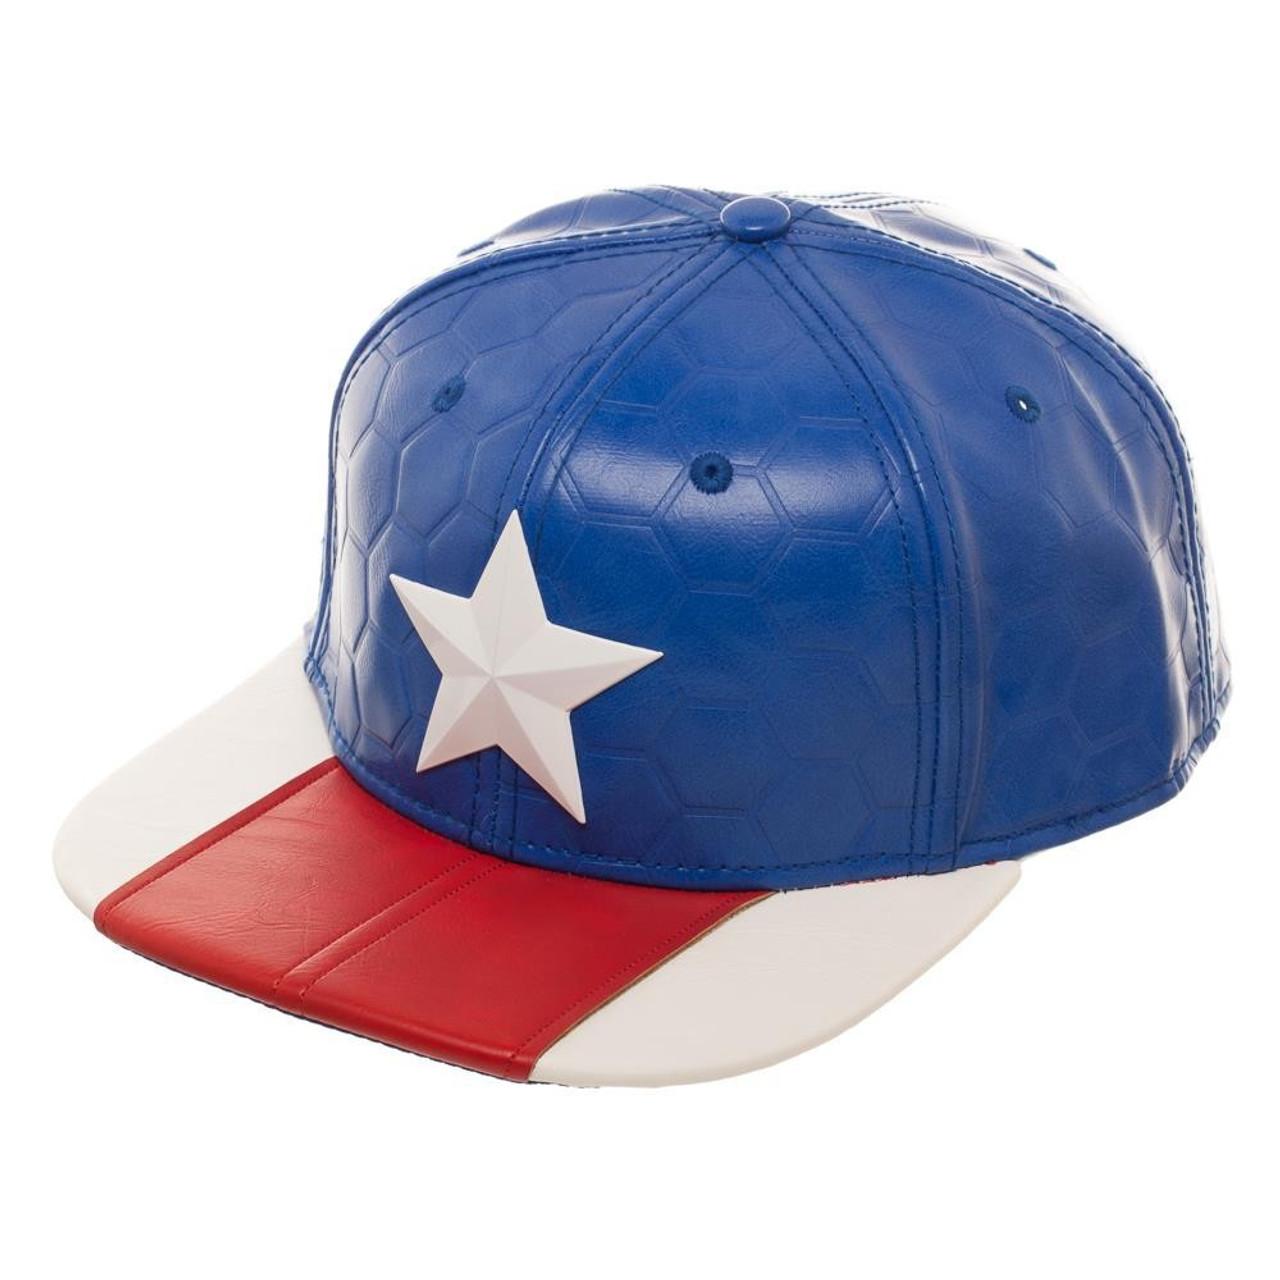 Marvel Deadpool Captain America Now Suit Up Snapback Cap Bioworld - ToyWiz 48a9896eae6